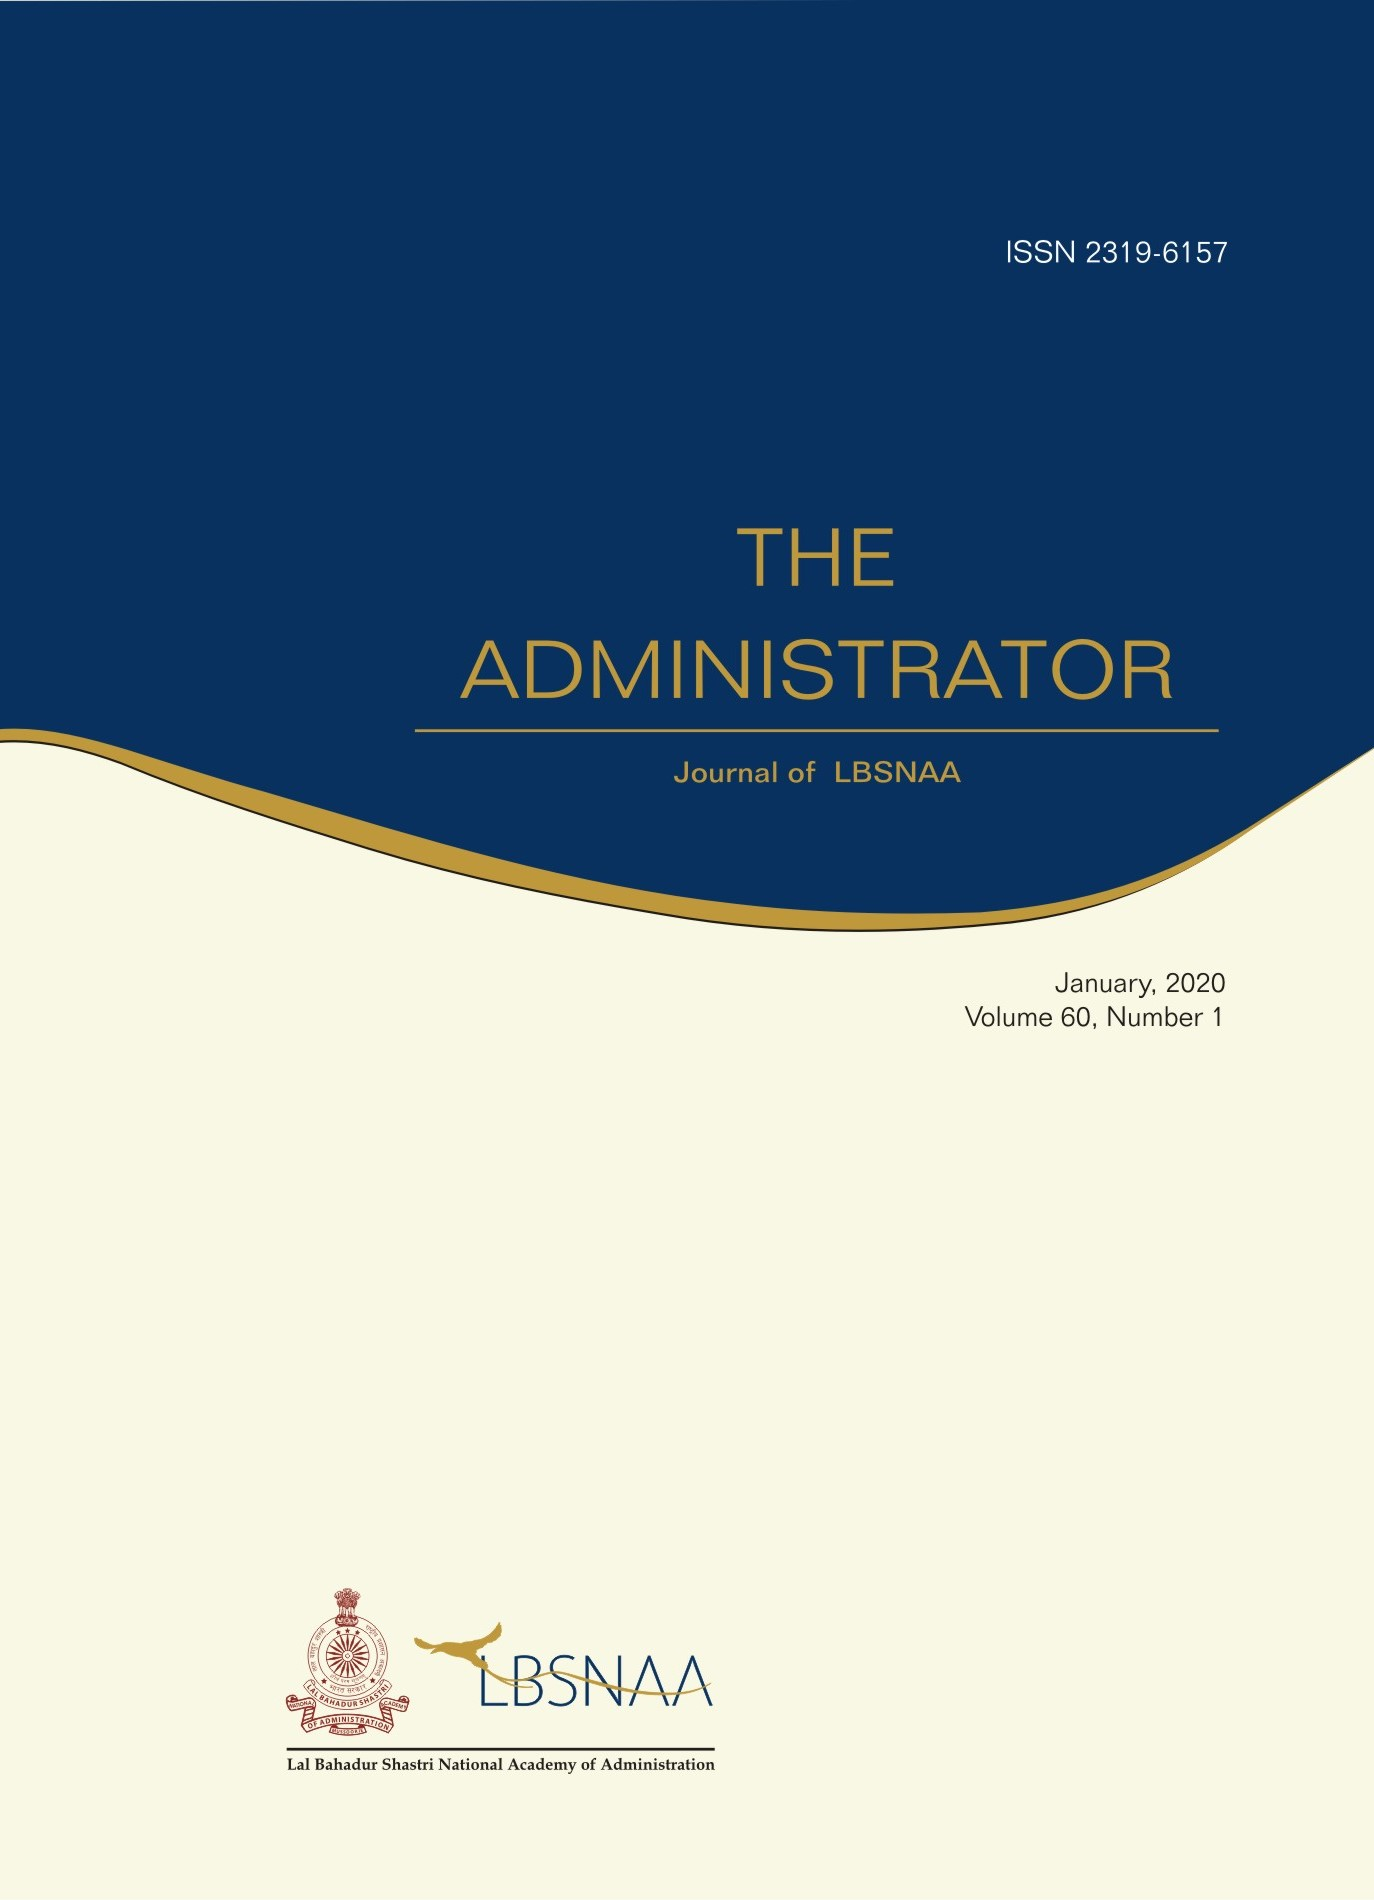 The Administrator Vol.60 No.1